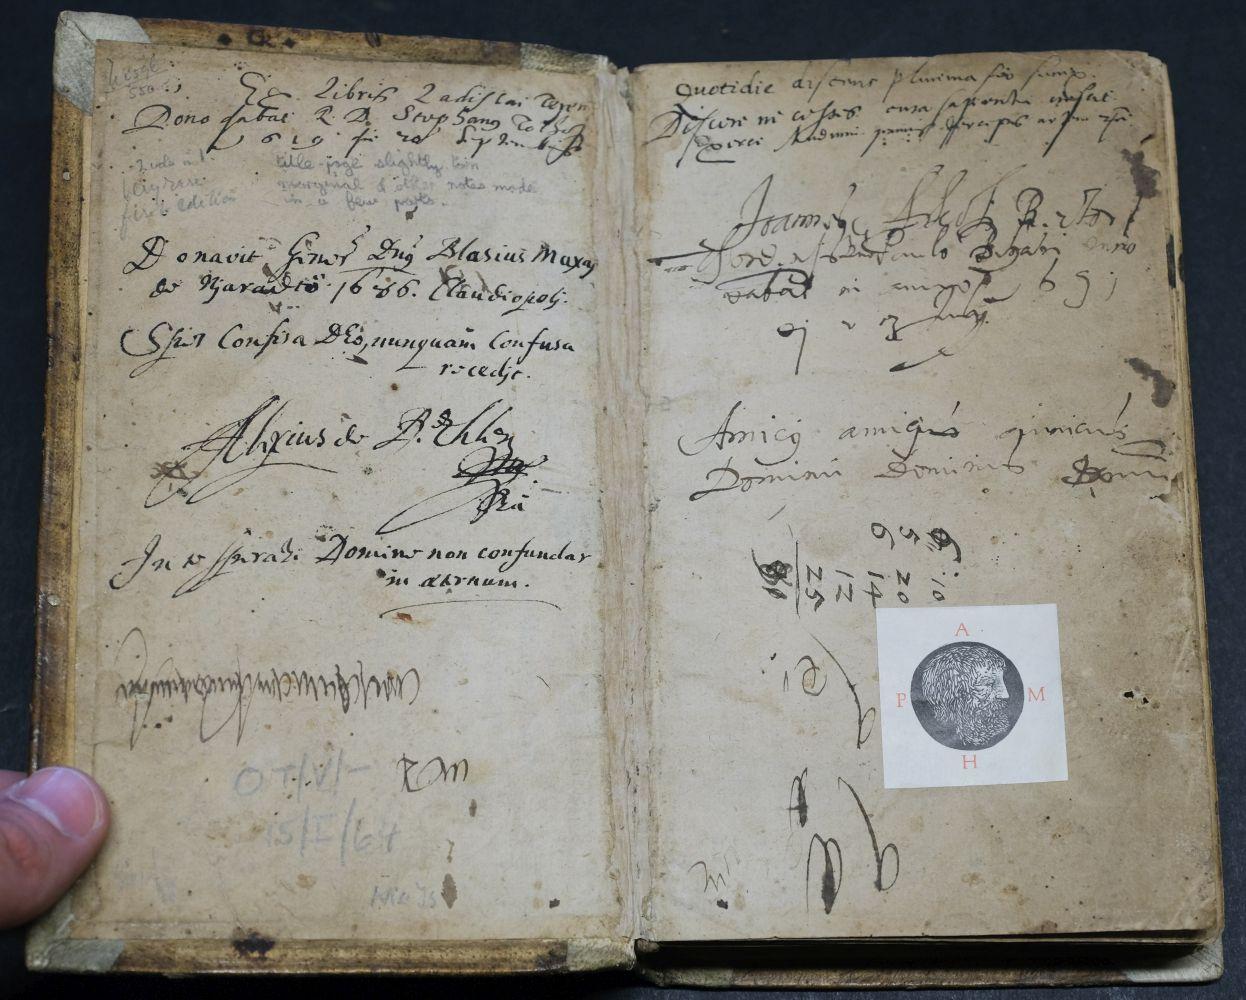 Sambucus (Joannes). Emblemata, Antwerp: Christopher Plantin, 1564 - Image 6 of 11